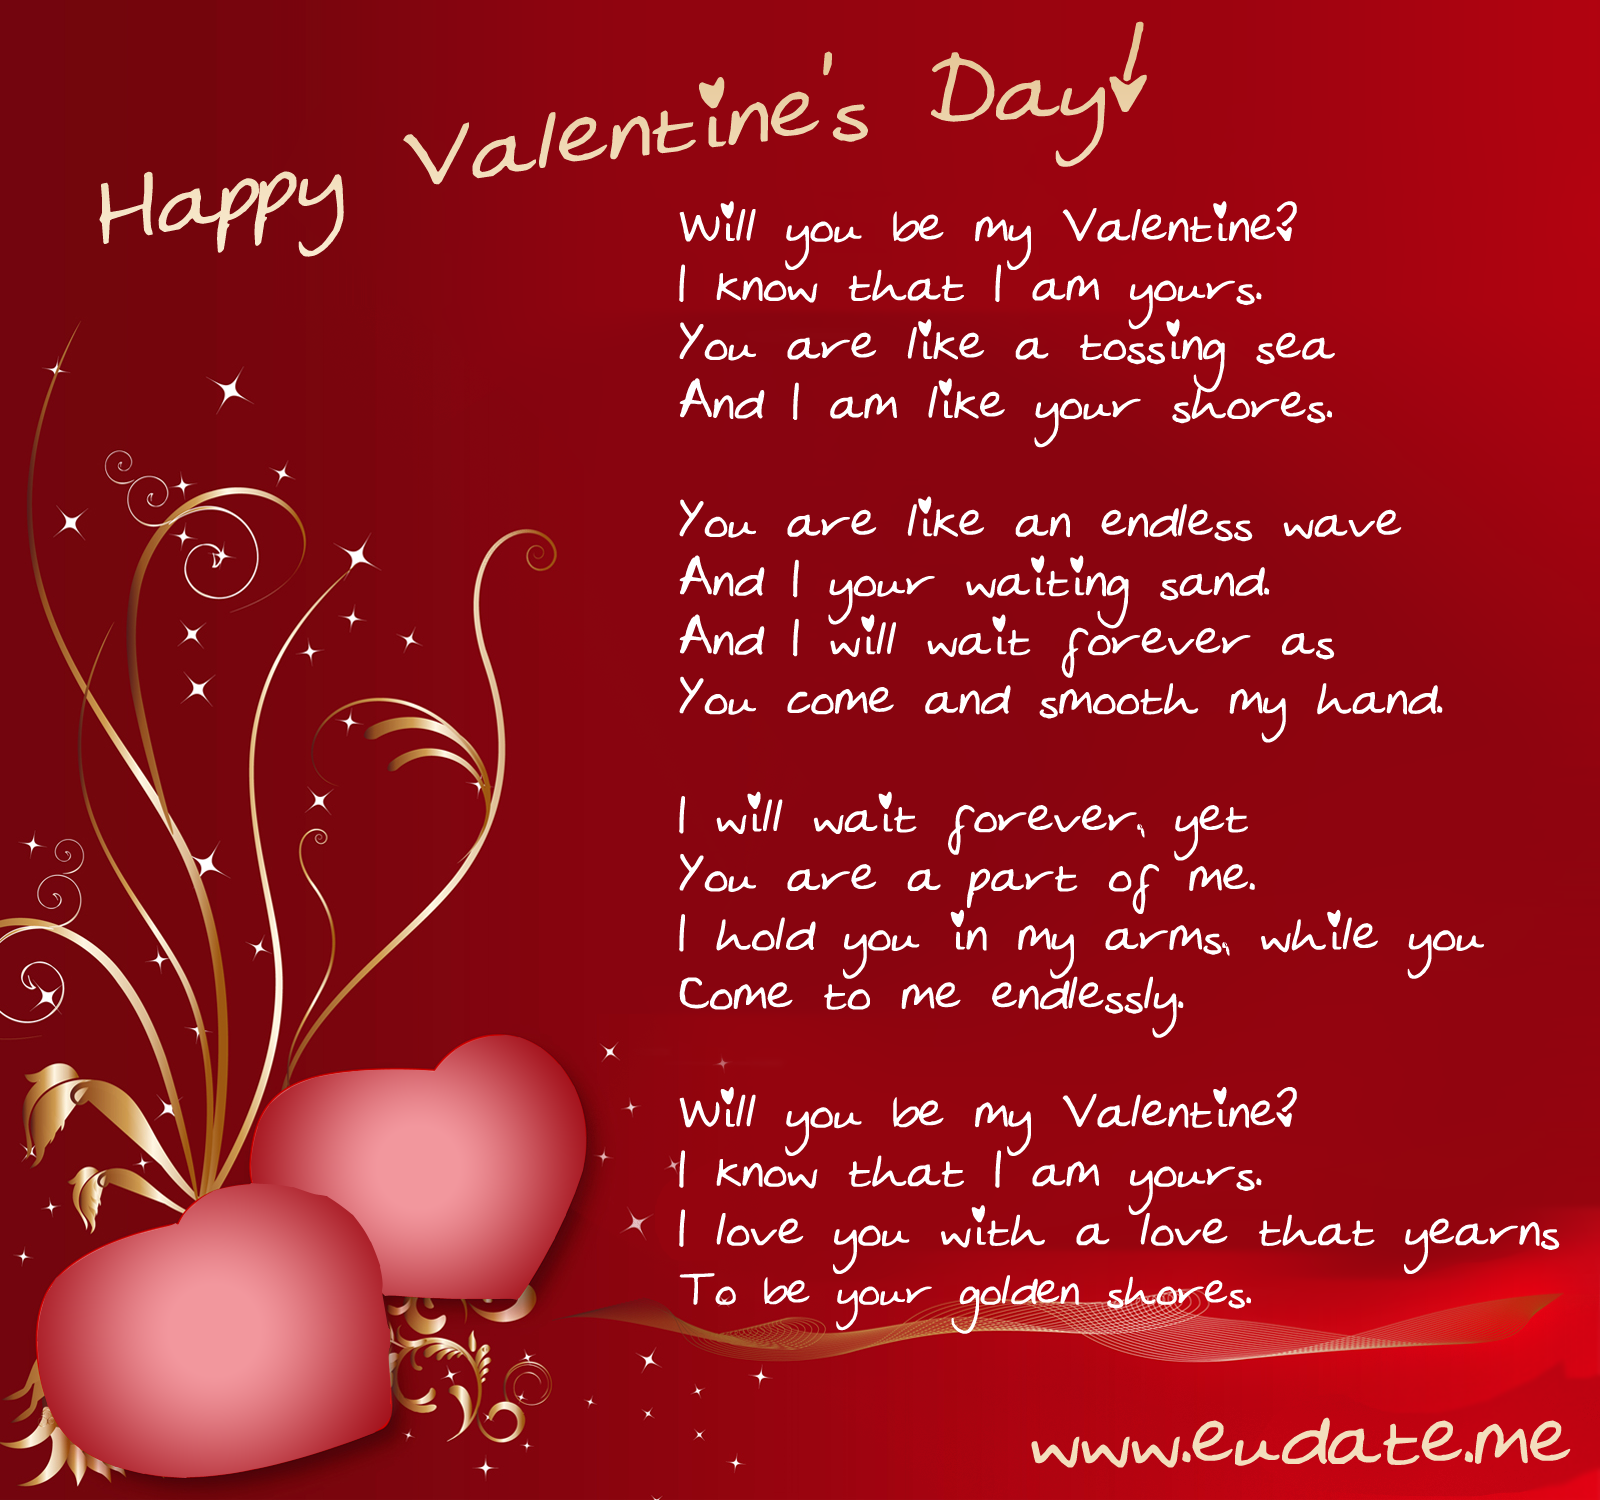 Harri Dwi Haryanto-_____________: Valentine's Day